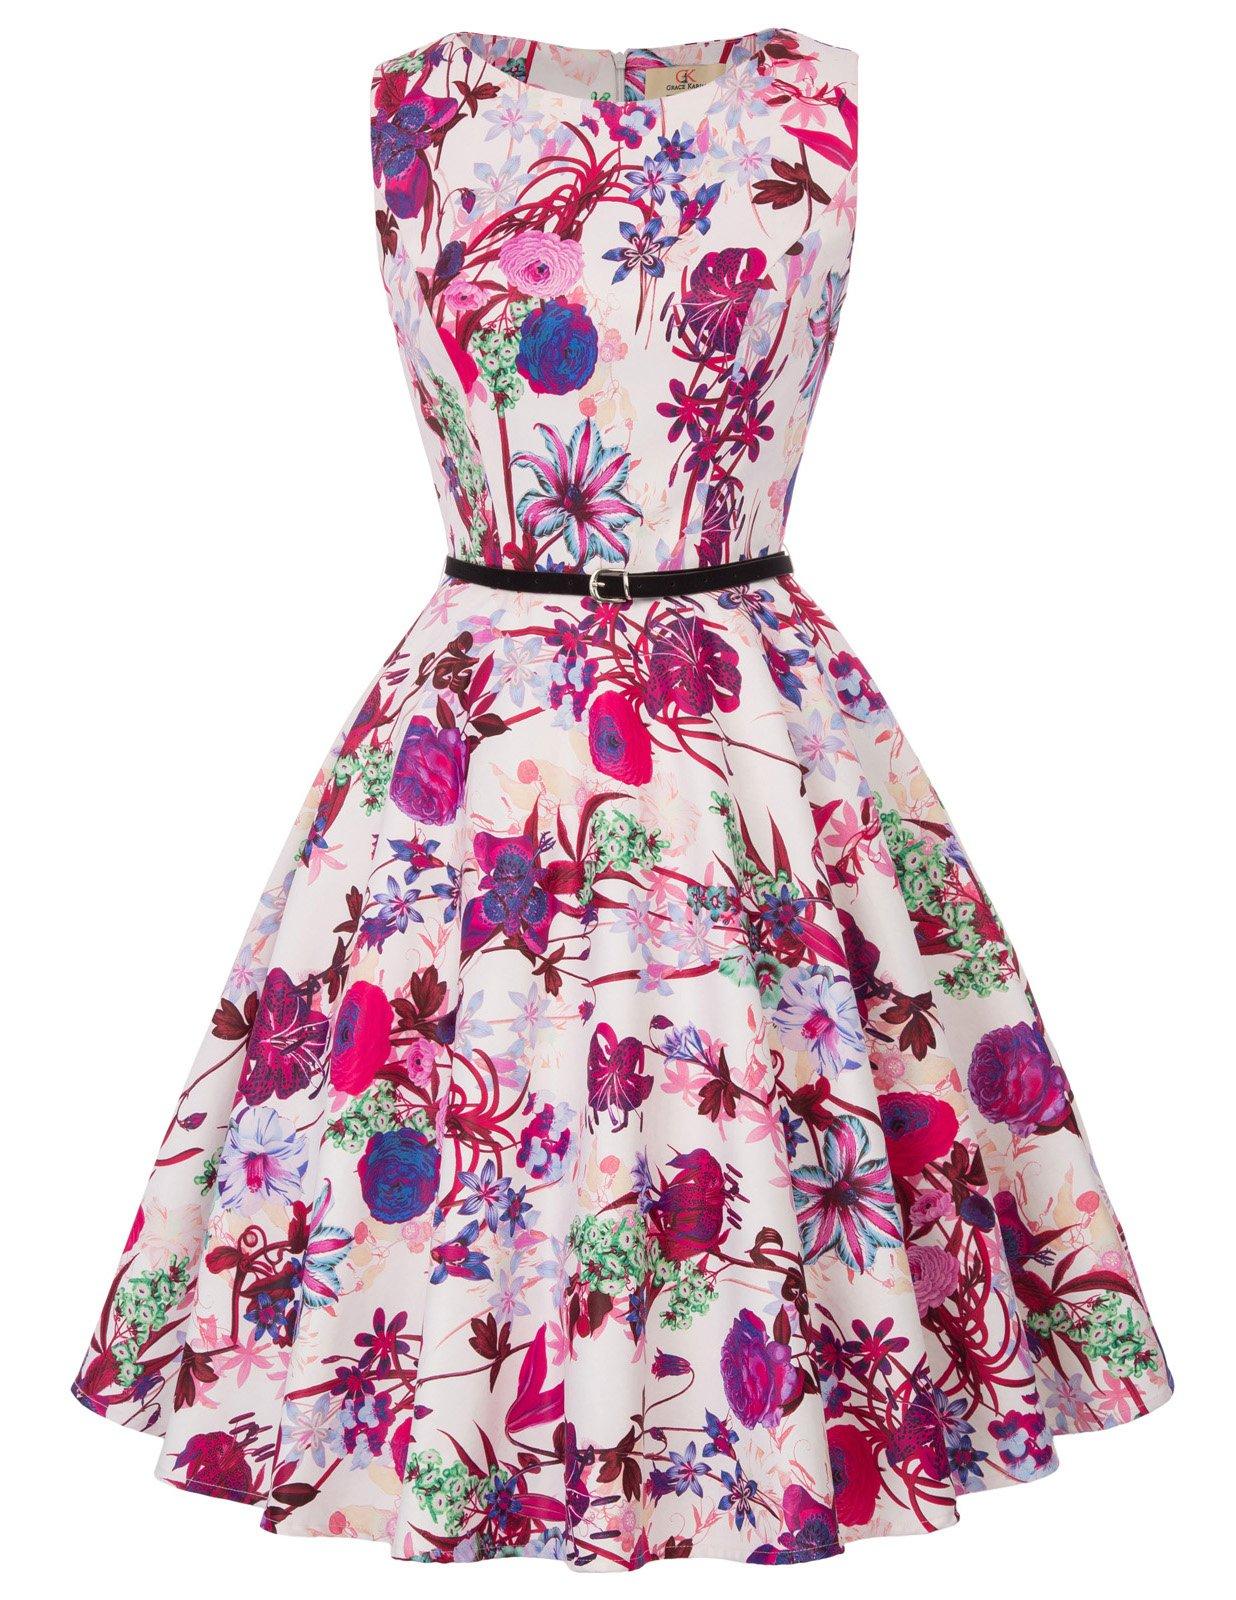 d882092e86bc65 Galleon - Belle Poque Boat Neck Sleeveless Swing 1950's Vintage Dress  Floral-2 Size M BP754-2